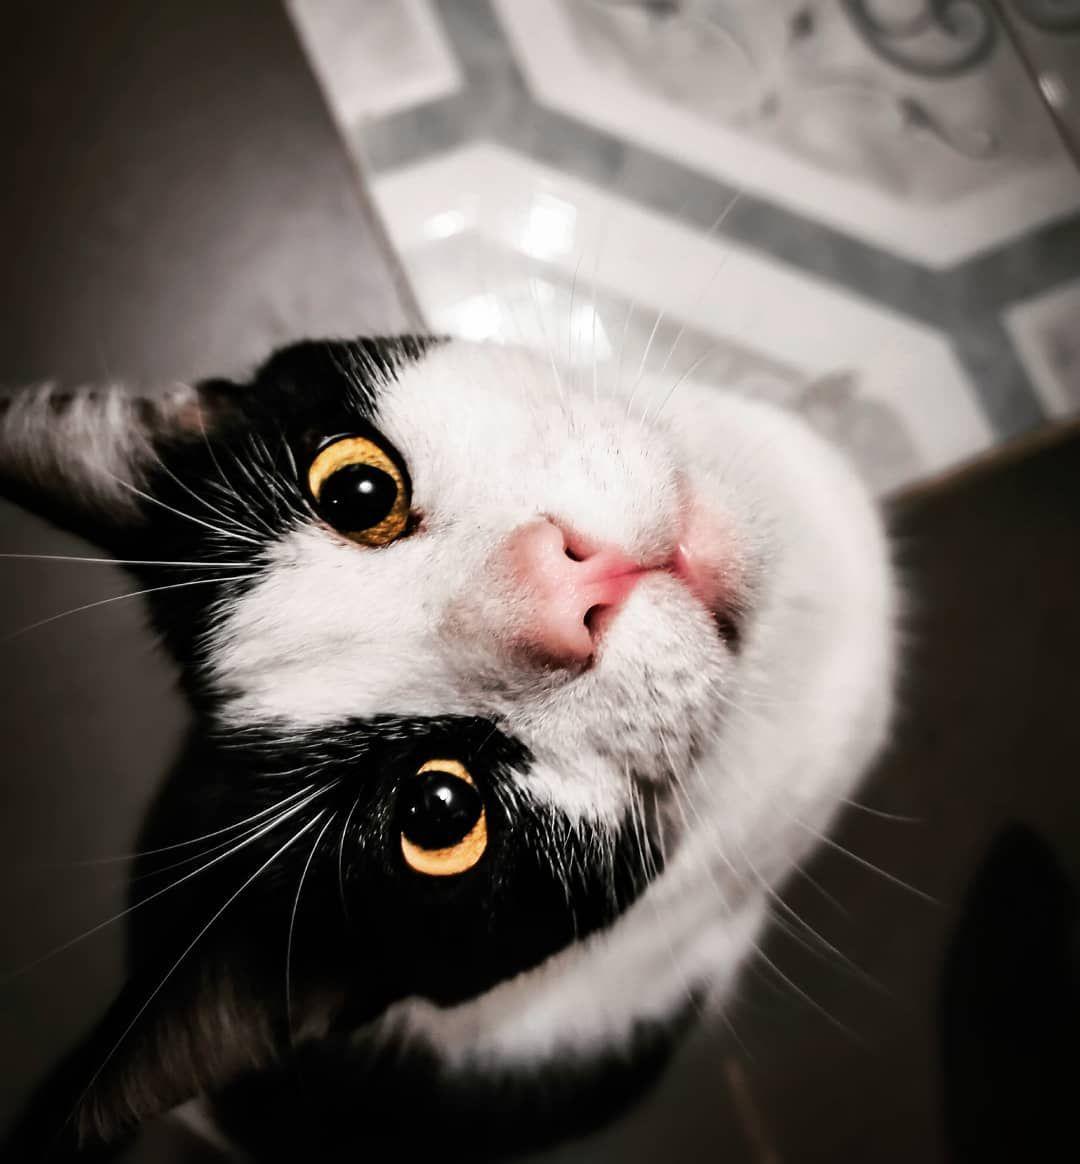 Una mirada de hambre  Mi Gatijo